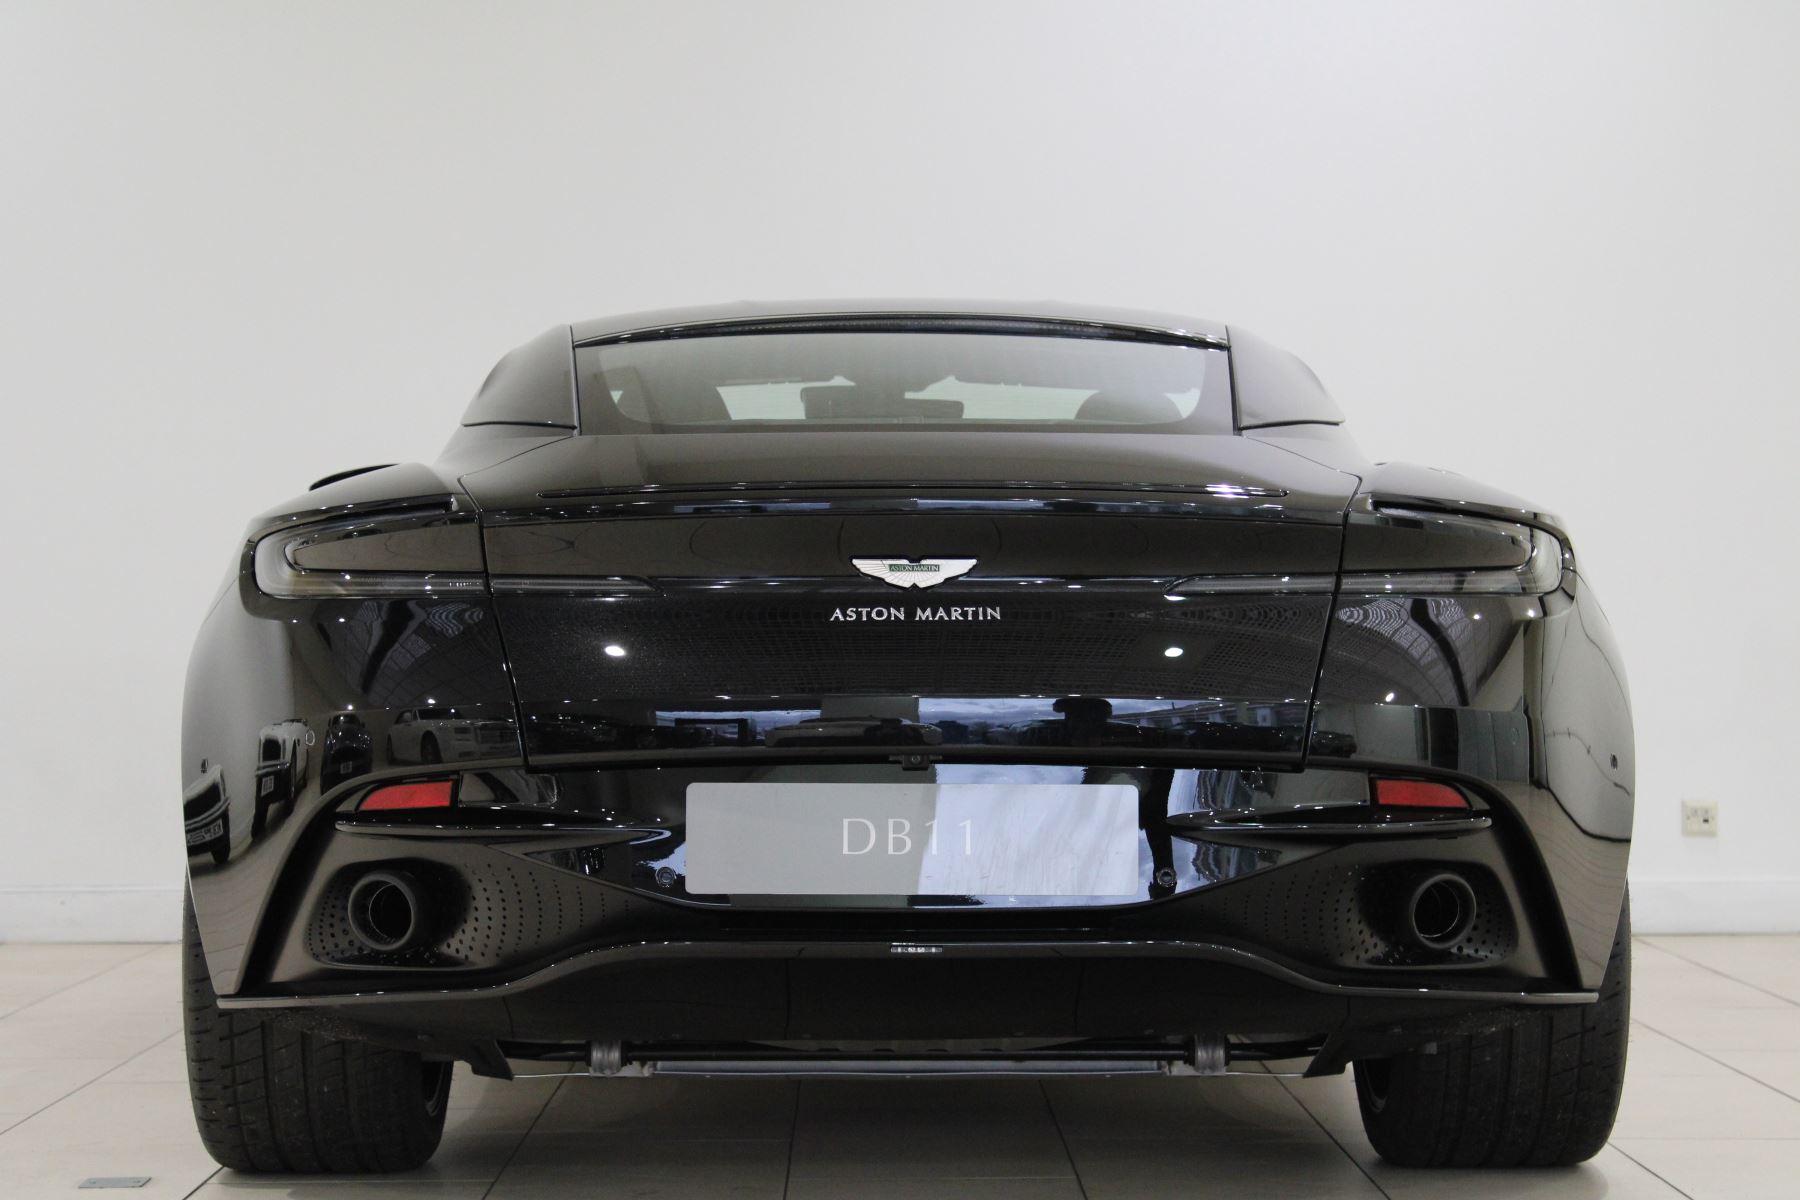 Aston Martin DB11 AMR Touchtronic image 6